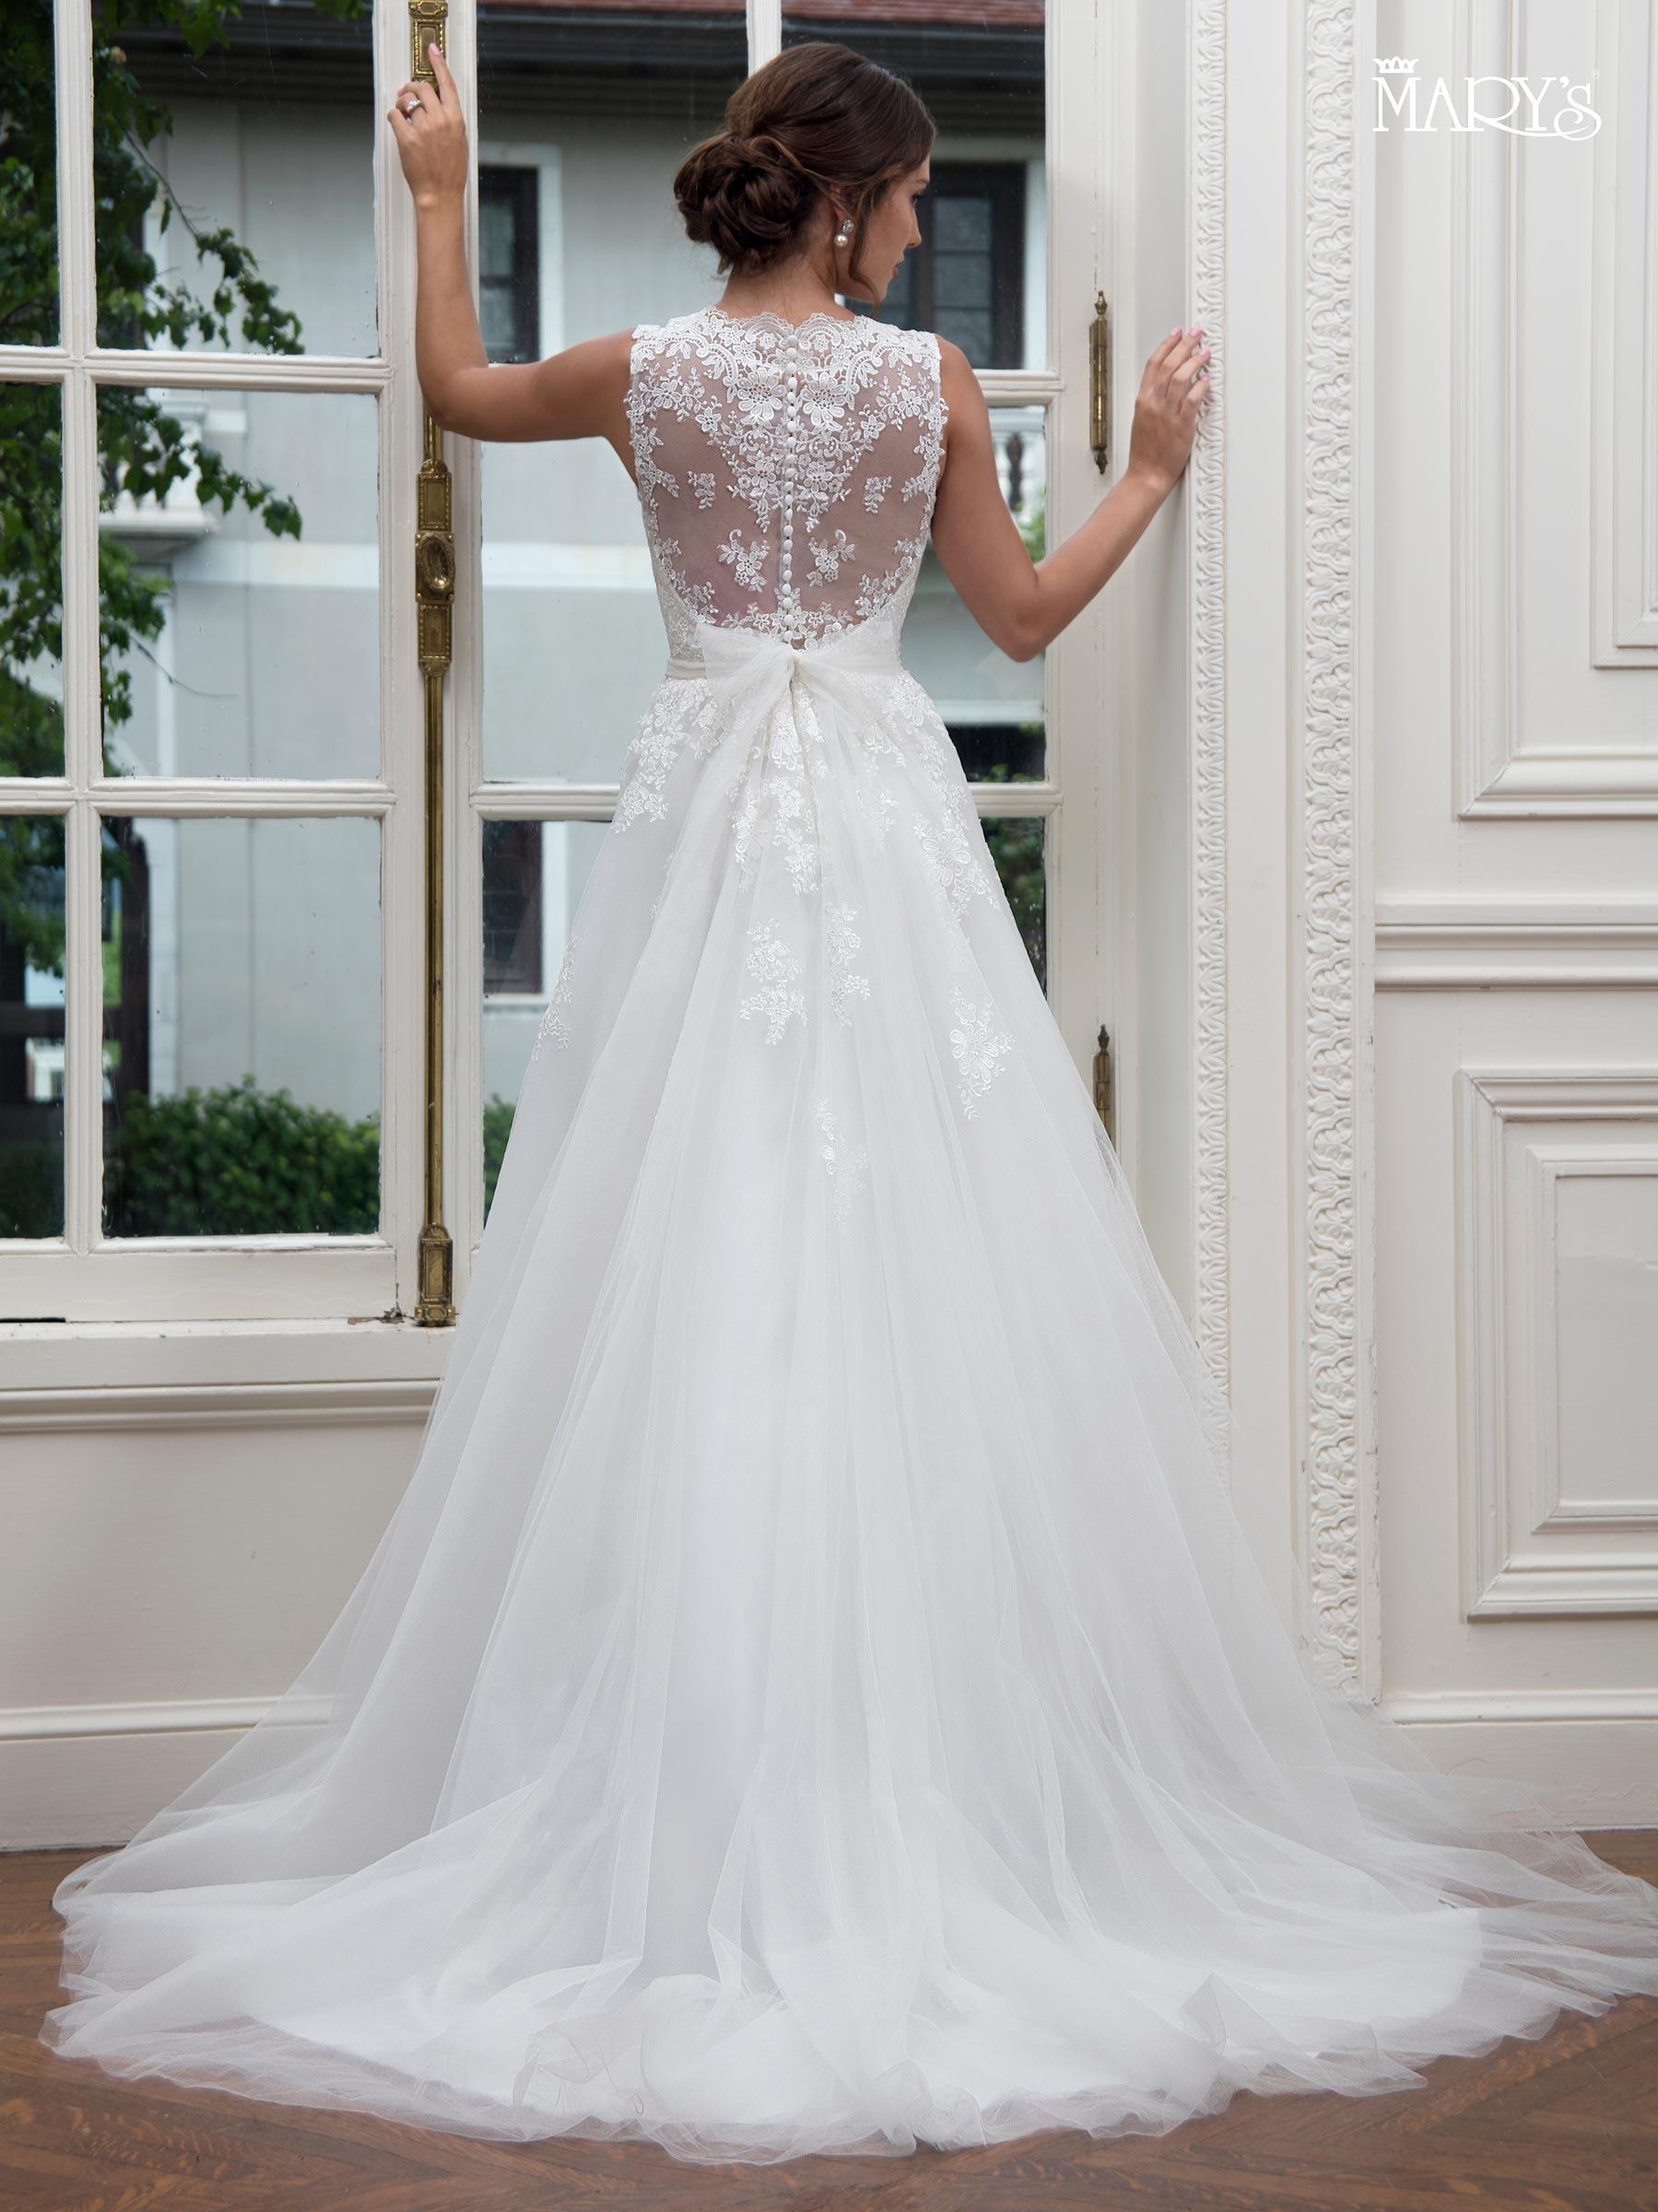 Bridal Wedding Dresses   Mary's   Style - MB3002